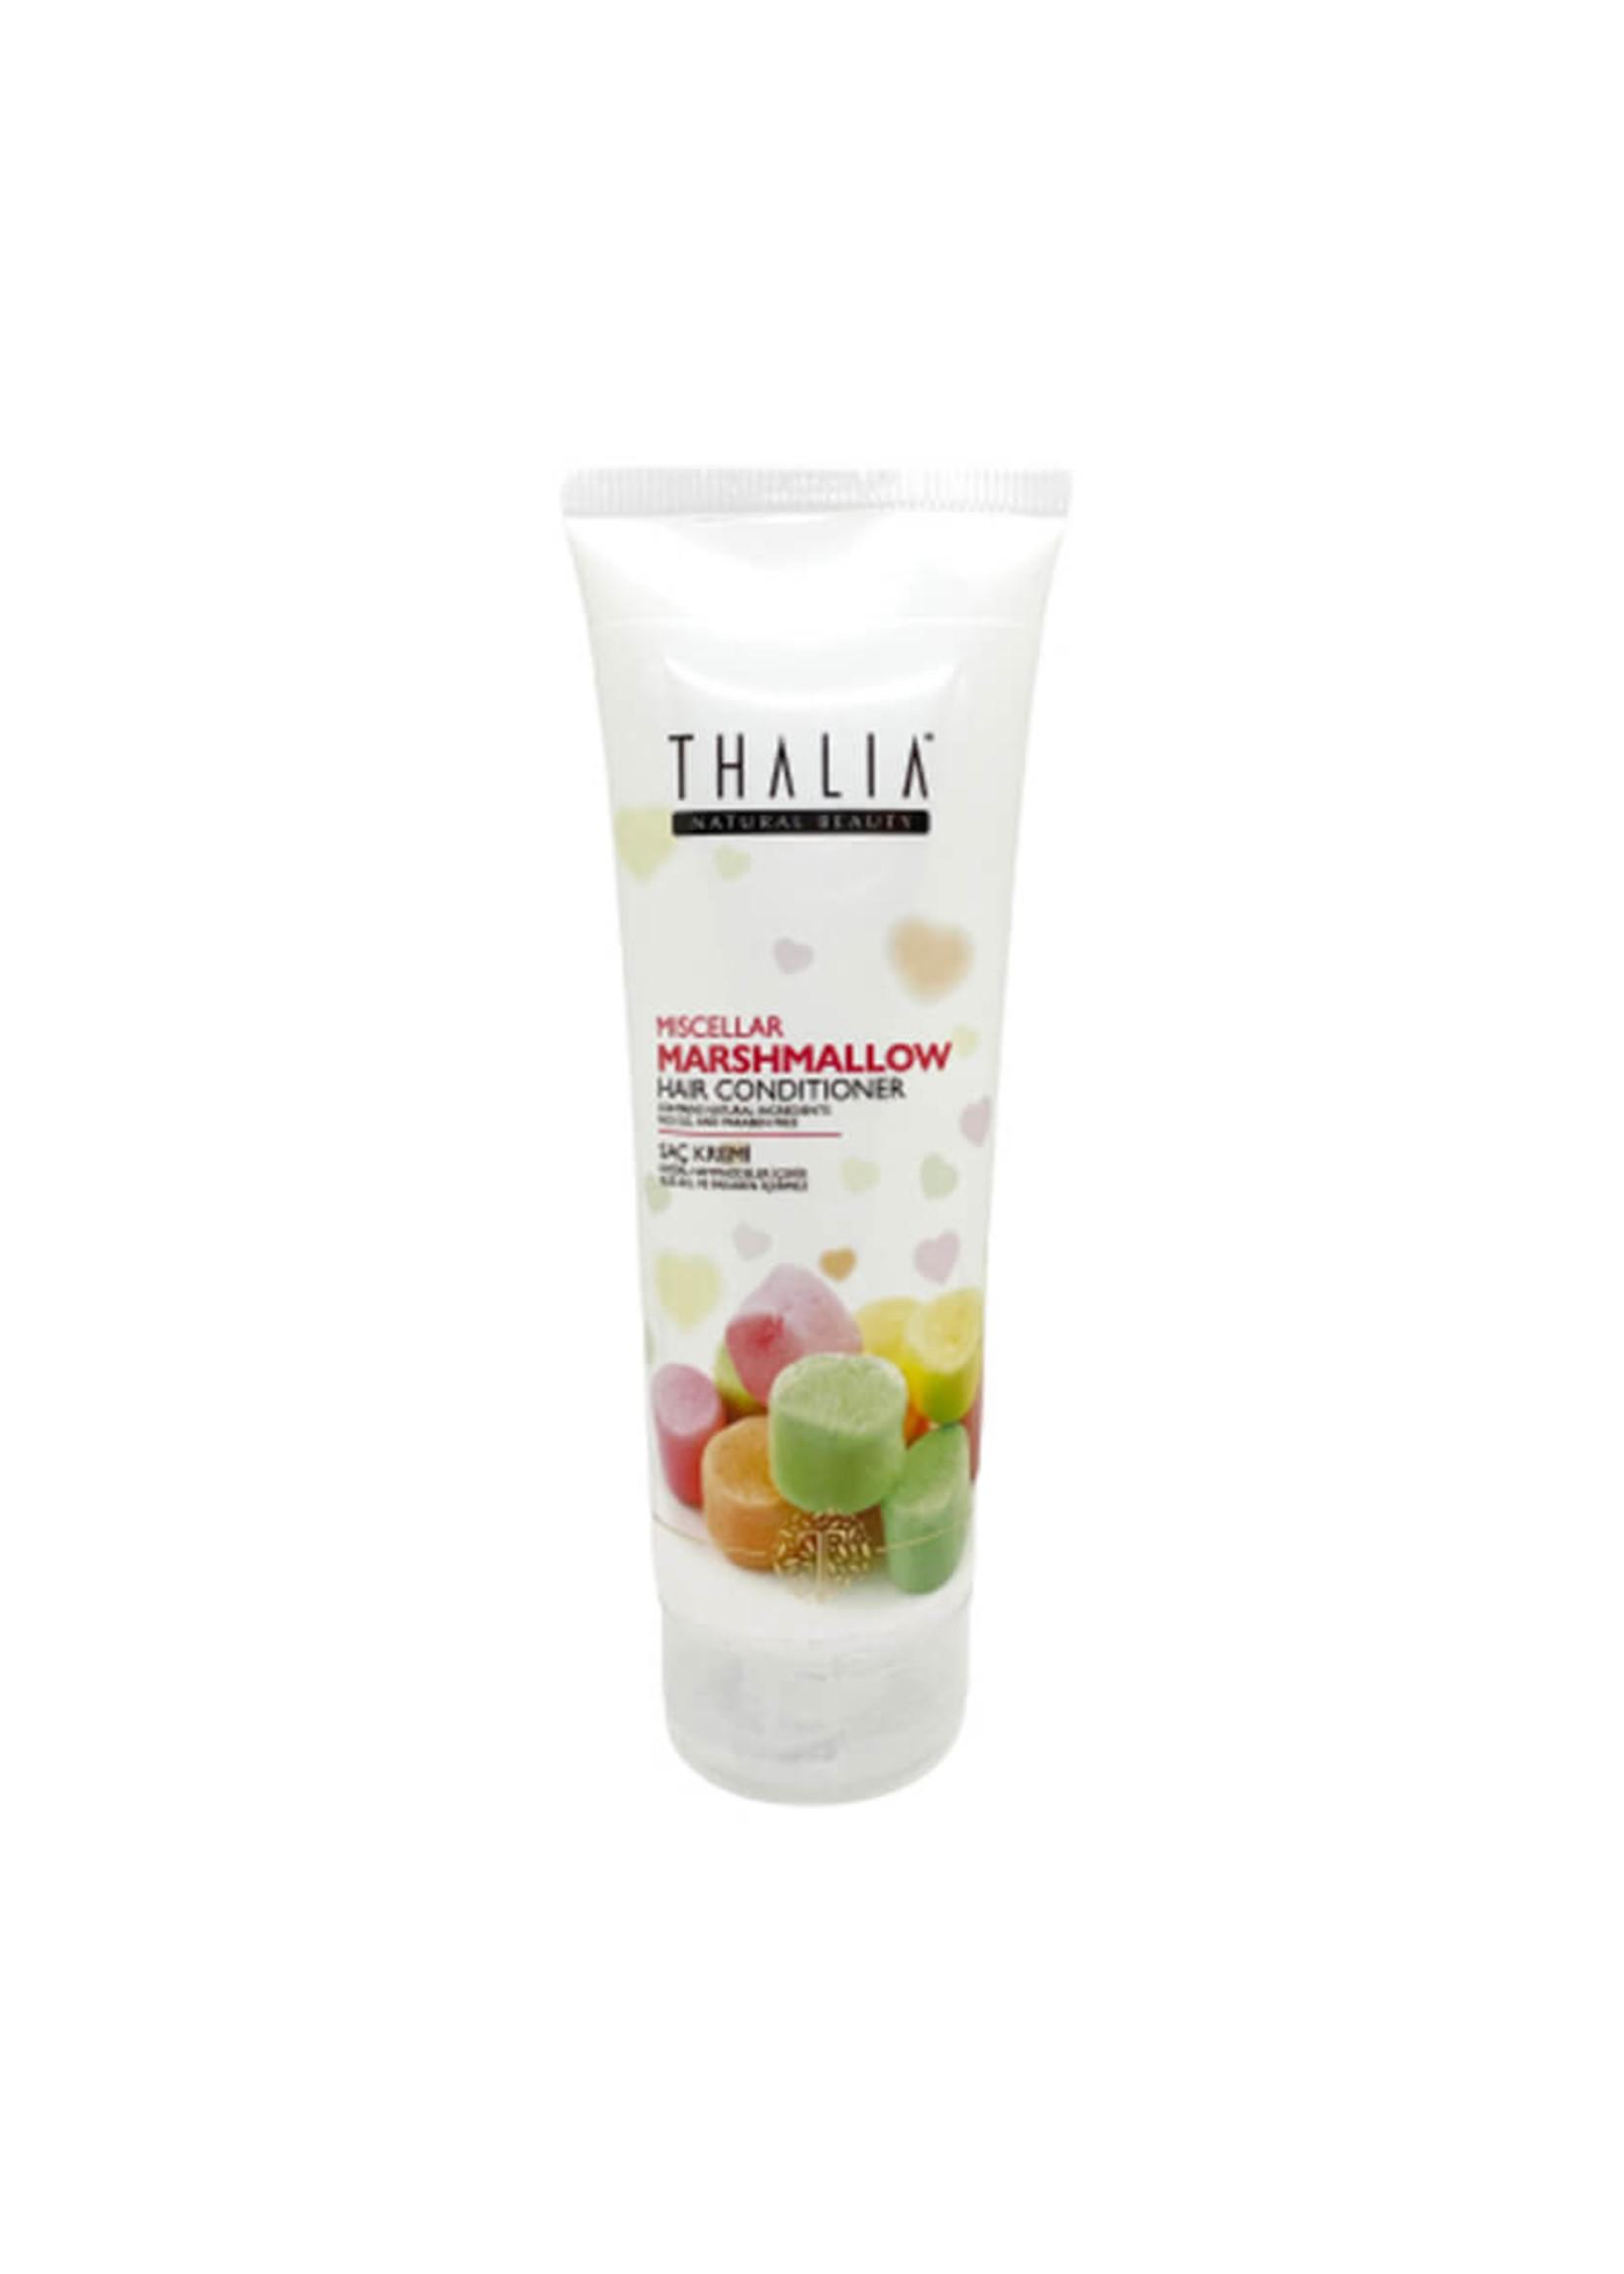 Thalia Marshmallow Conditioner 250 ml